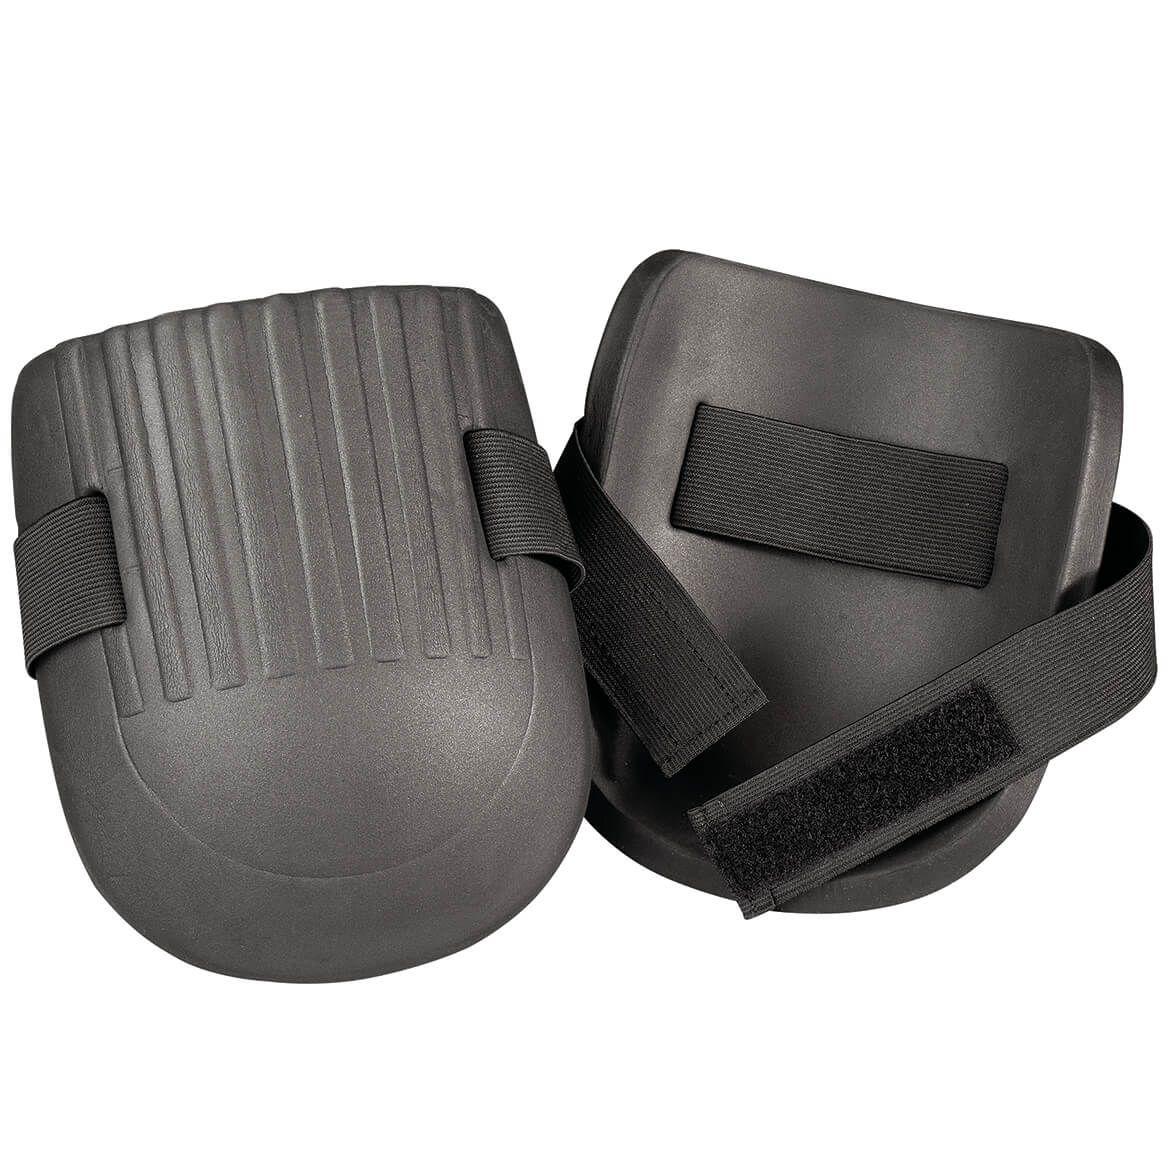 Ultralight Gardening Knee Pads-371507